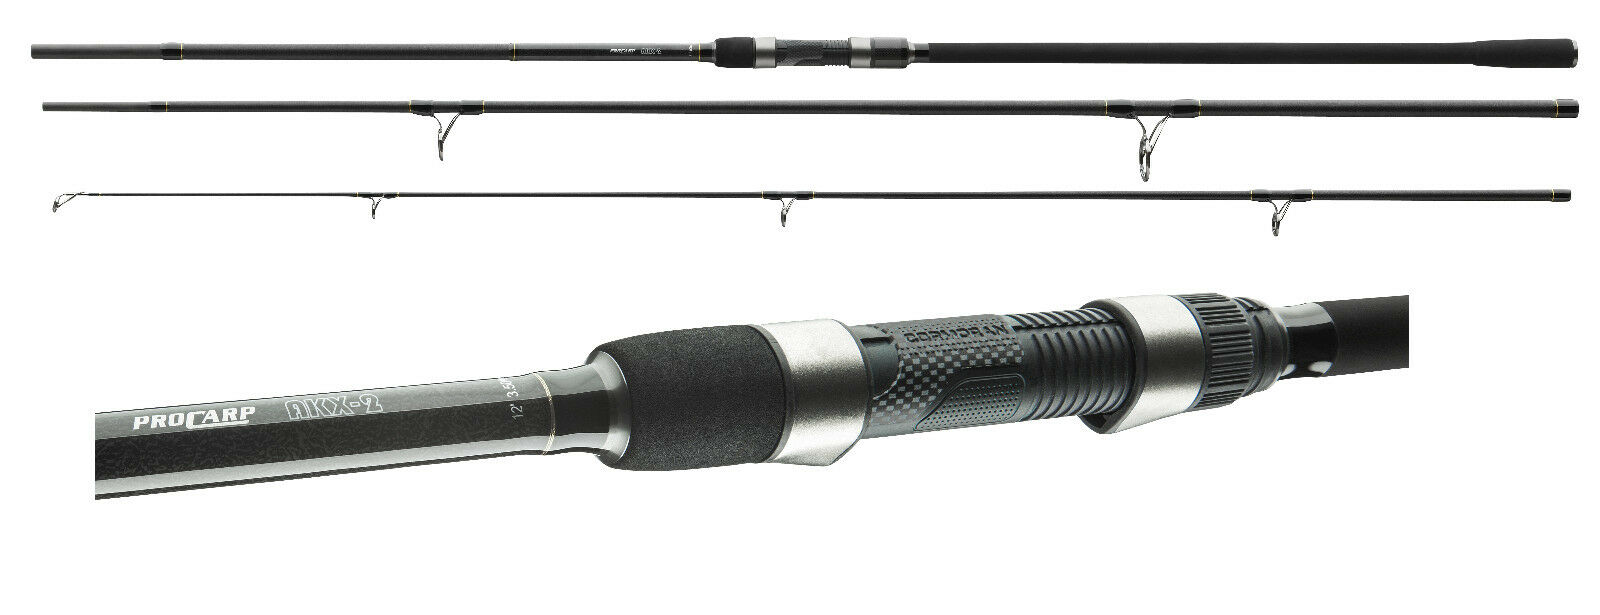 Cormoran Pro Carp AKX-2 3,60m / 3,0lbs Karpfenrute 3-teilig Karpfenangel Rute